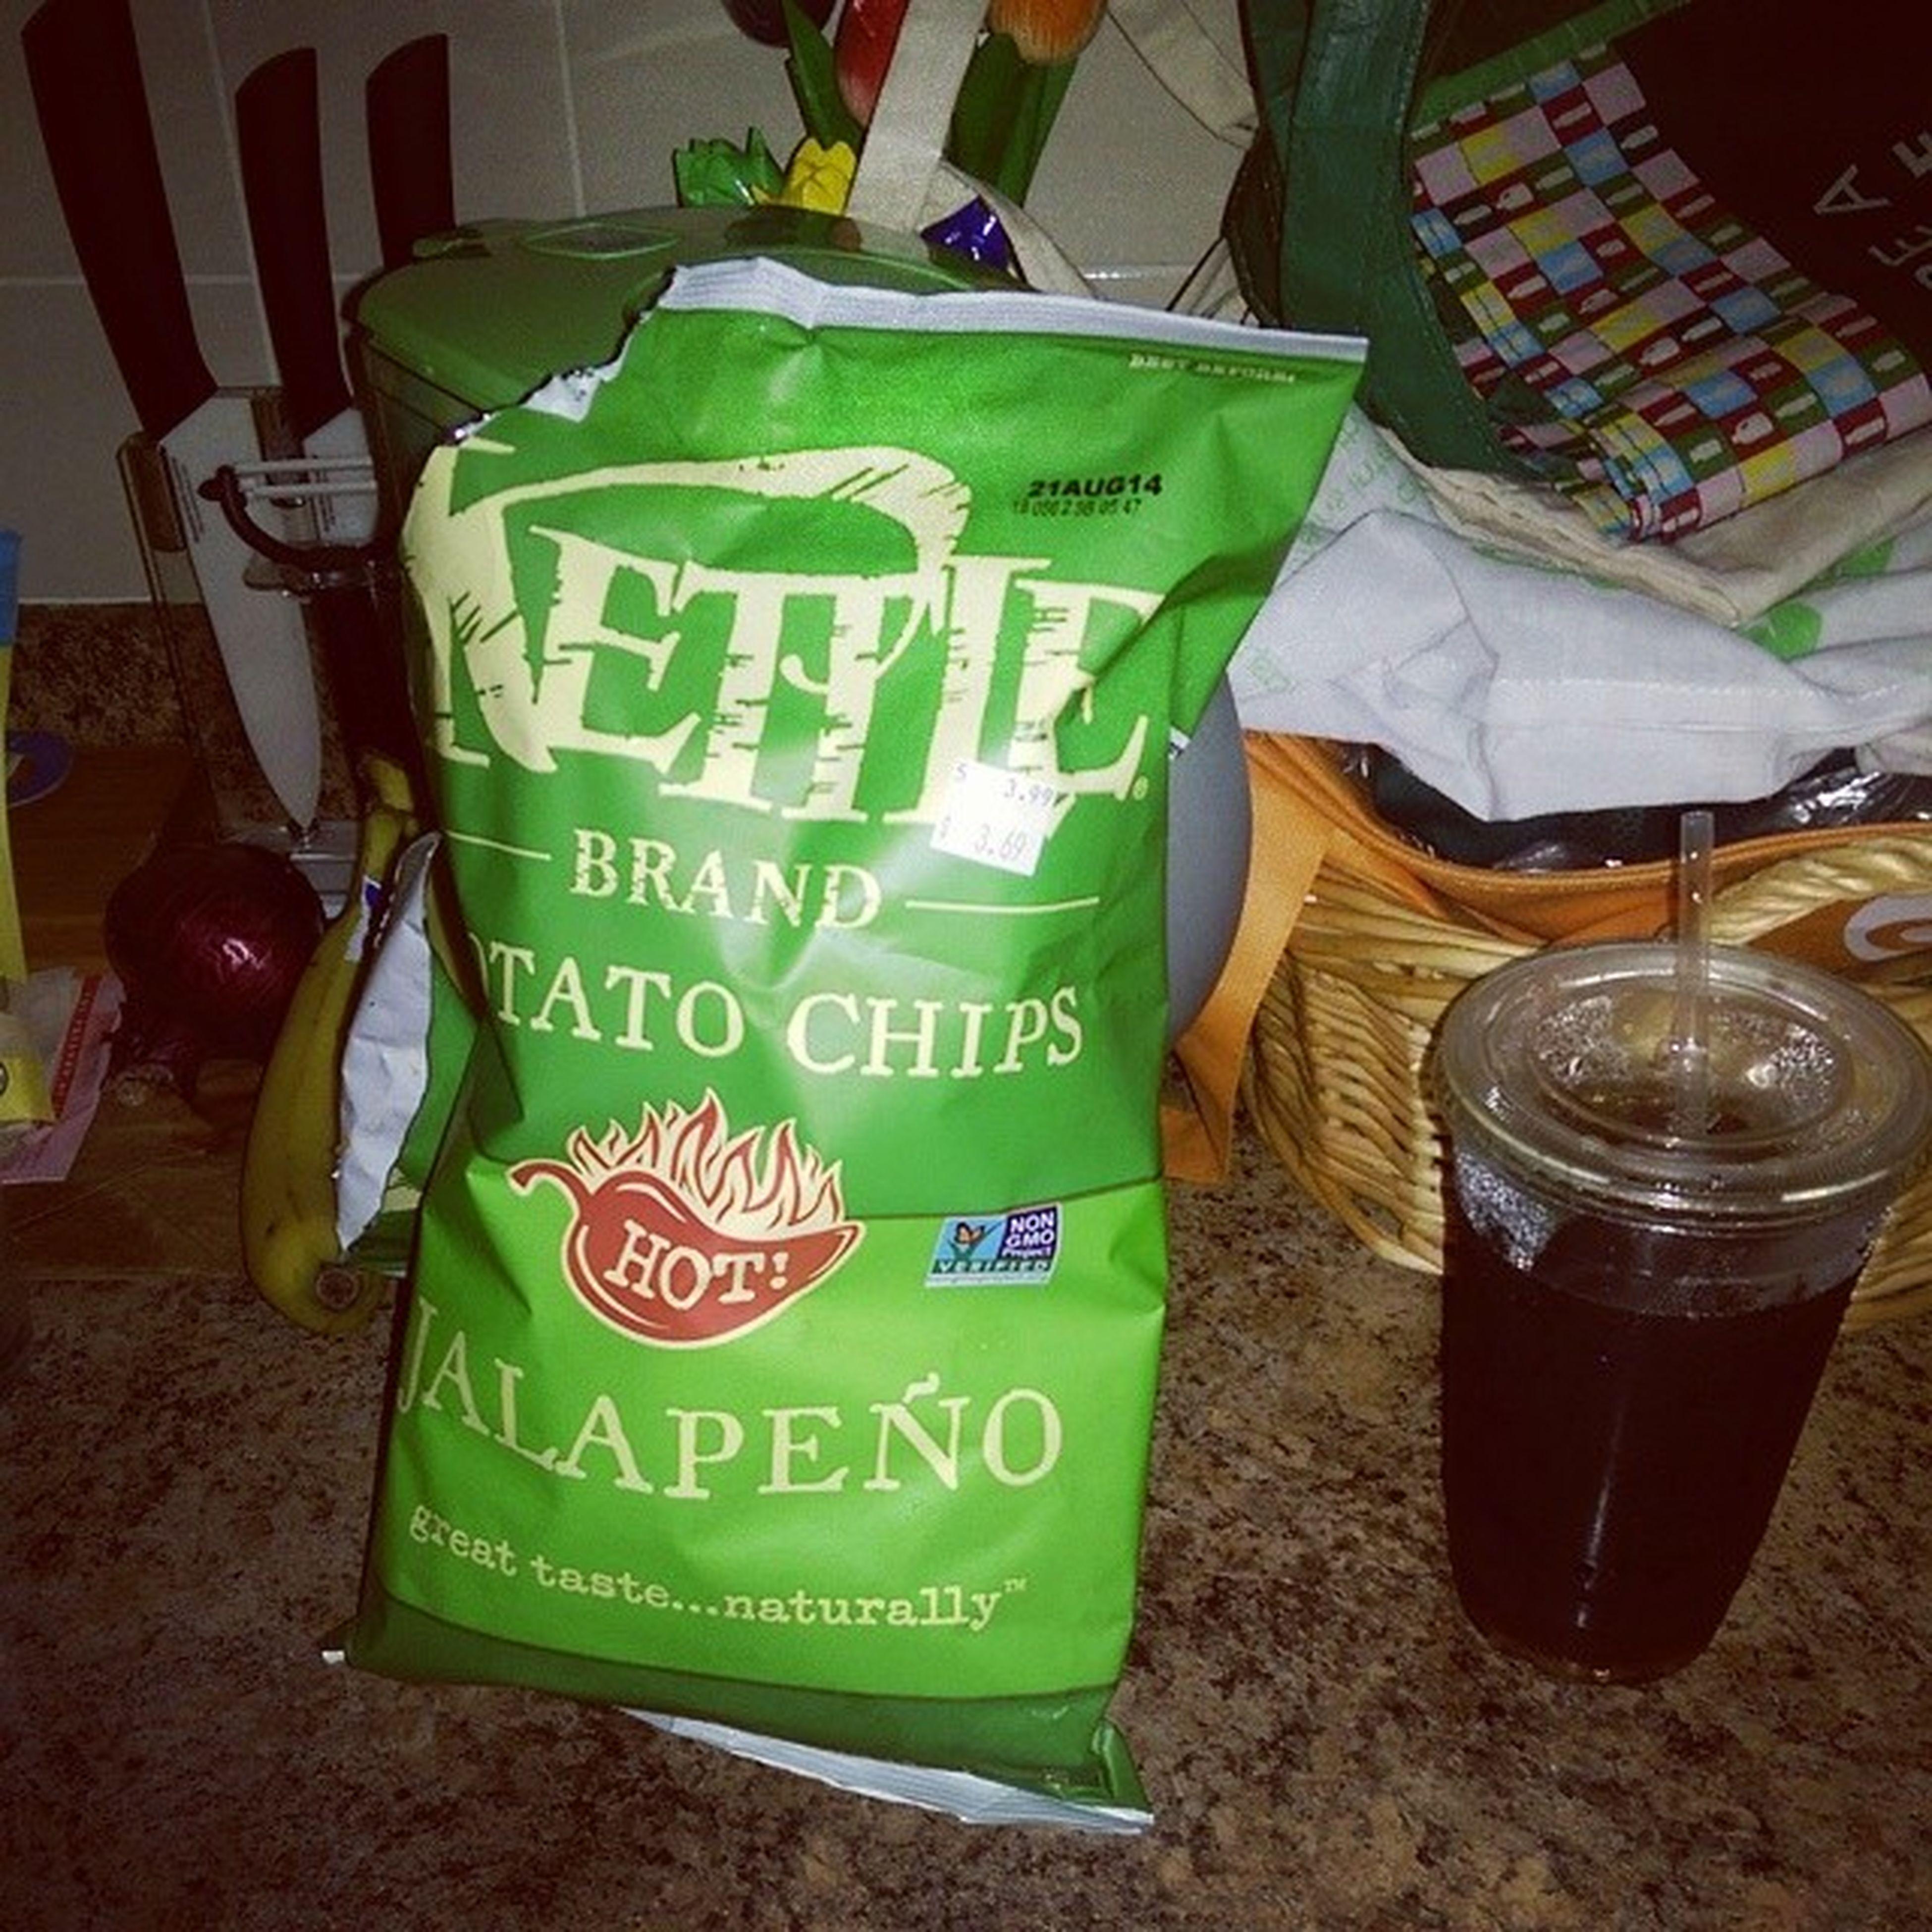 Minticedtea and Kettlebrand Jalapeno Hot potatochips yummy